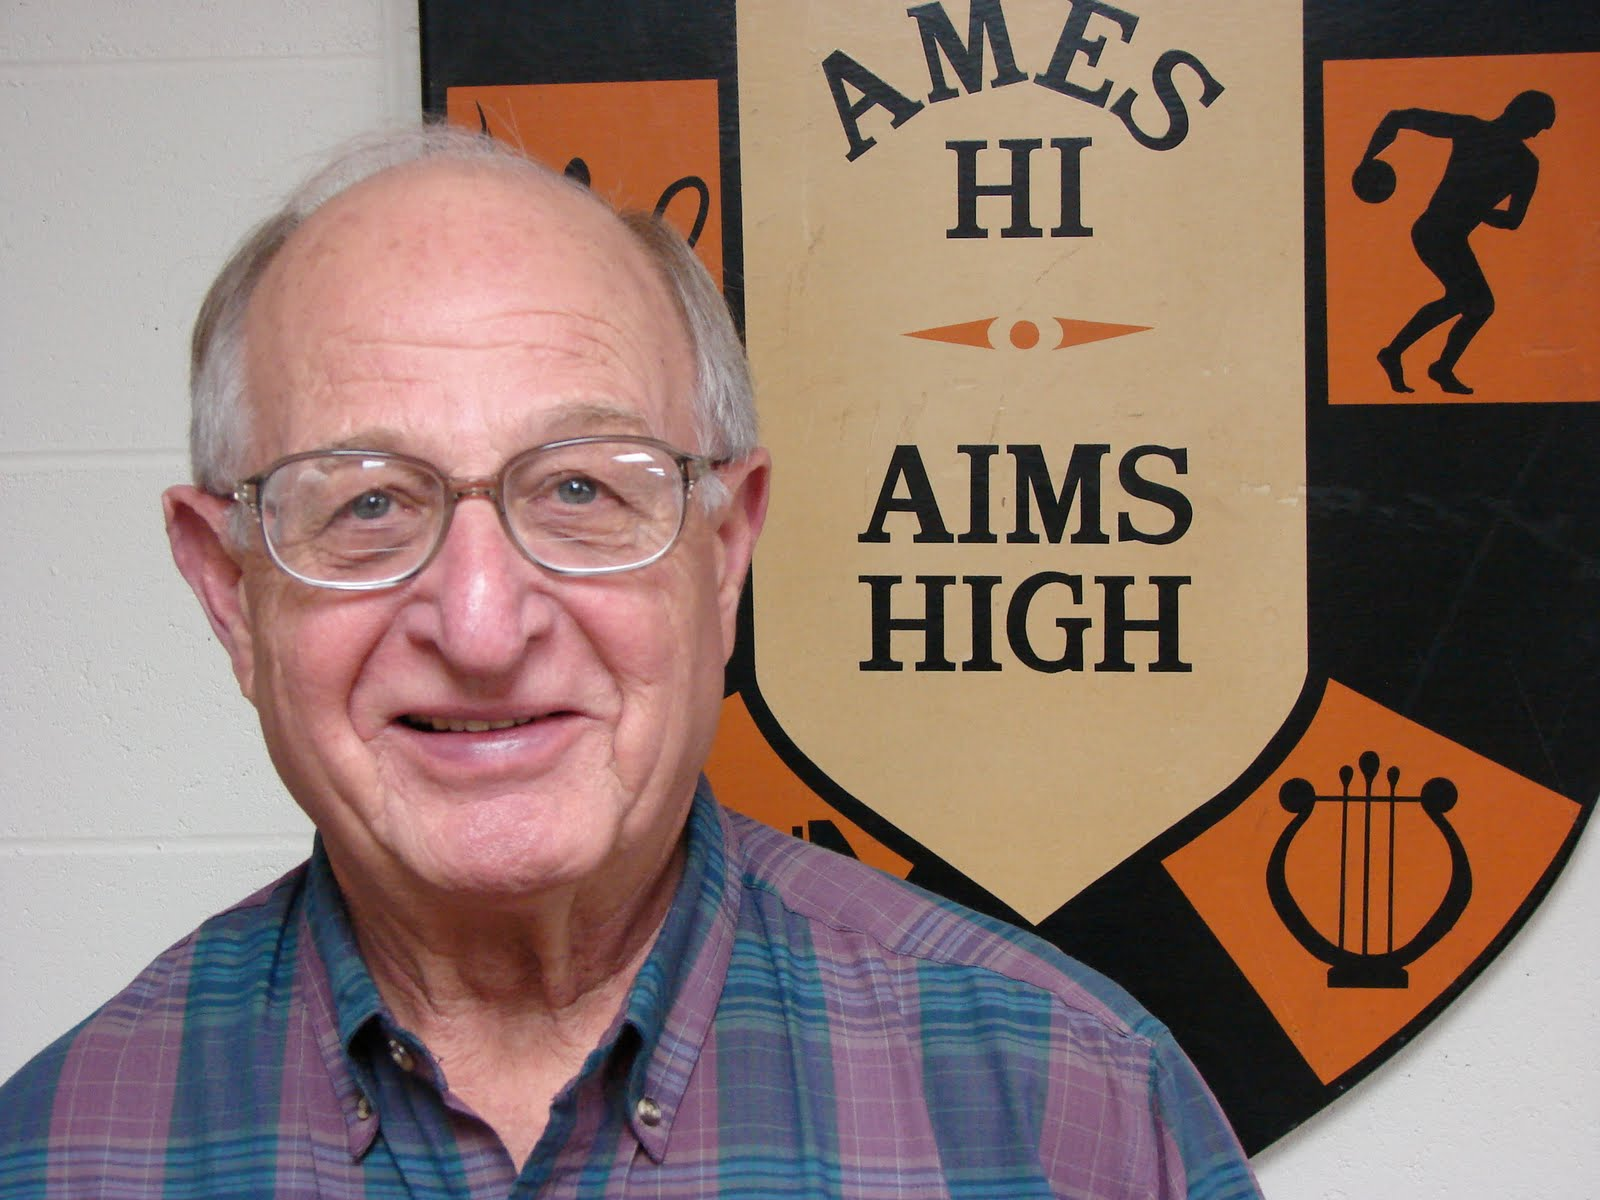 Photo: good of Bill Ripp with the Ames Hi Aims High logo behind him